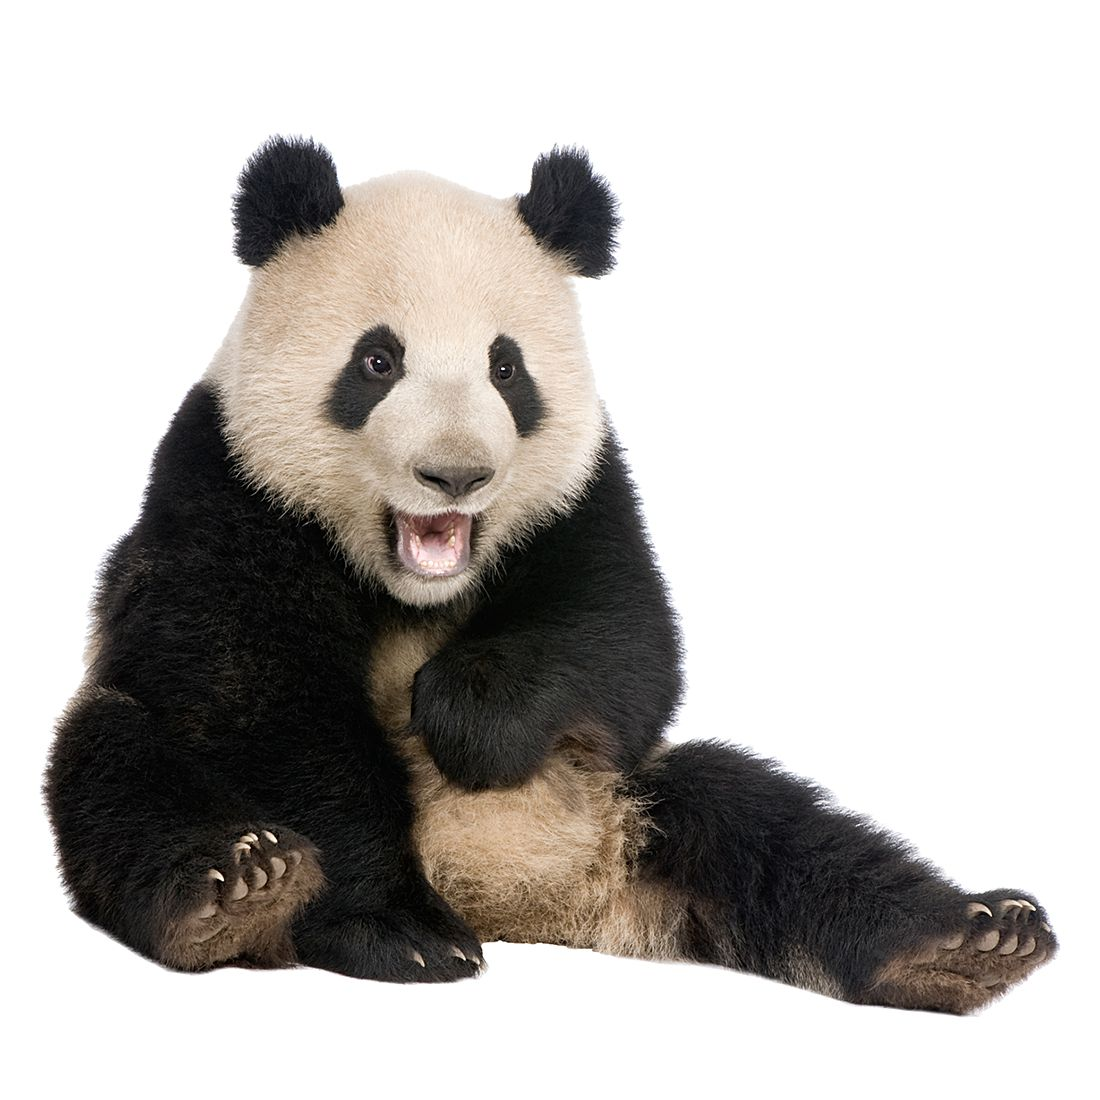 Wandtattoo Lachender Panda, Mantiburi günstig